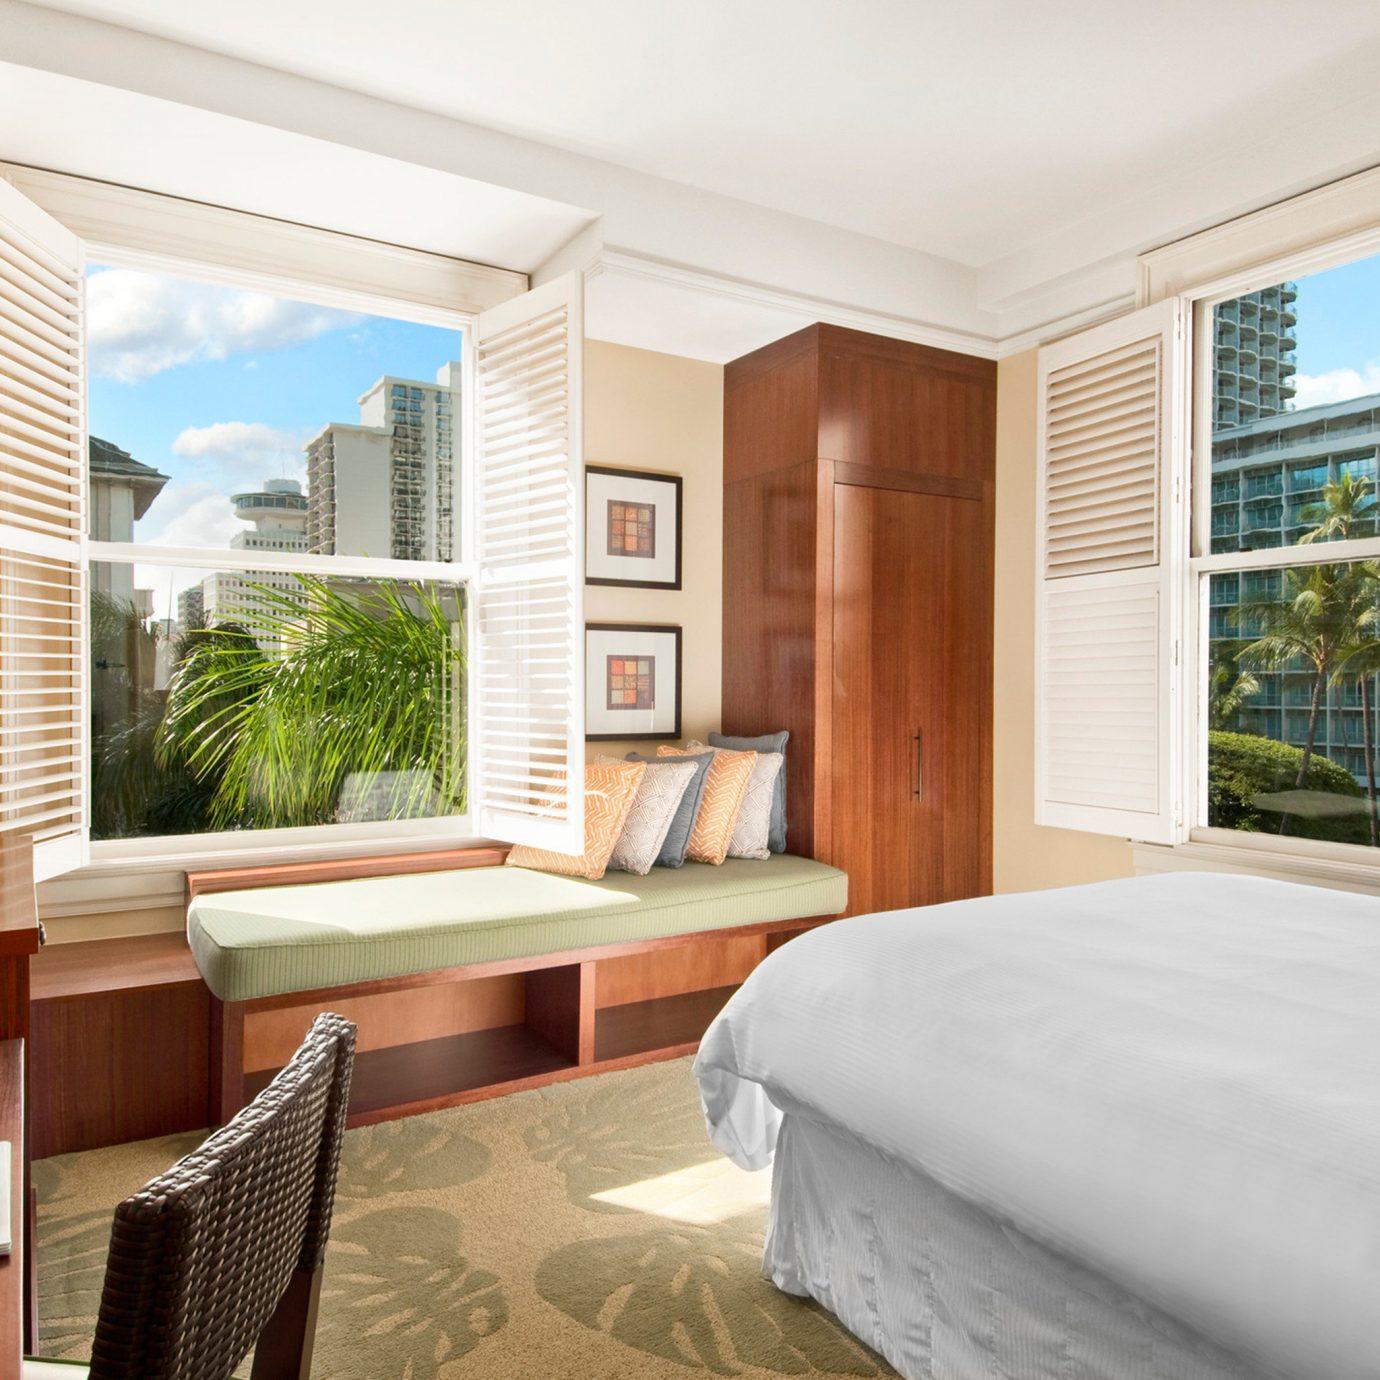 Bedroom Boutique Hotels Classic Hawaii Honolulu Hotels Resort Scenic views property condominium home living room Suite cottage Villa Modern